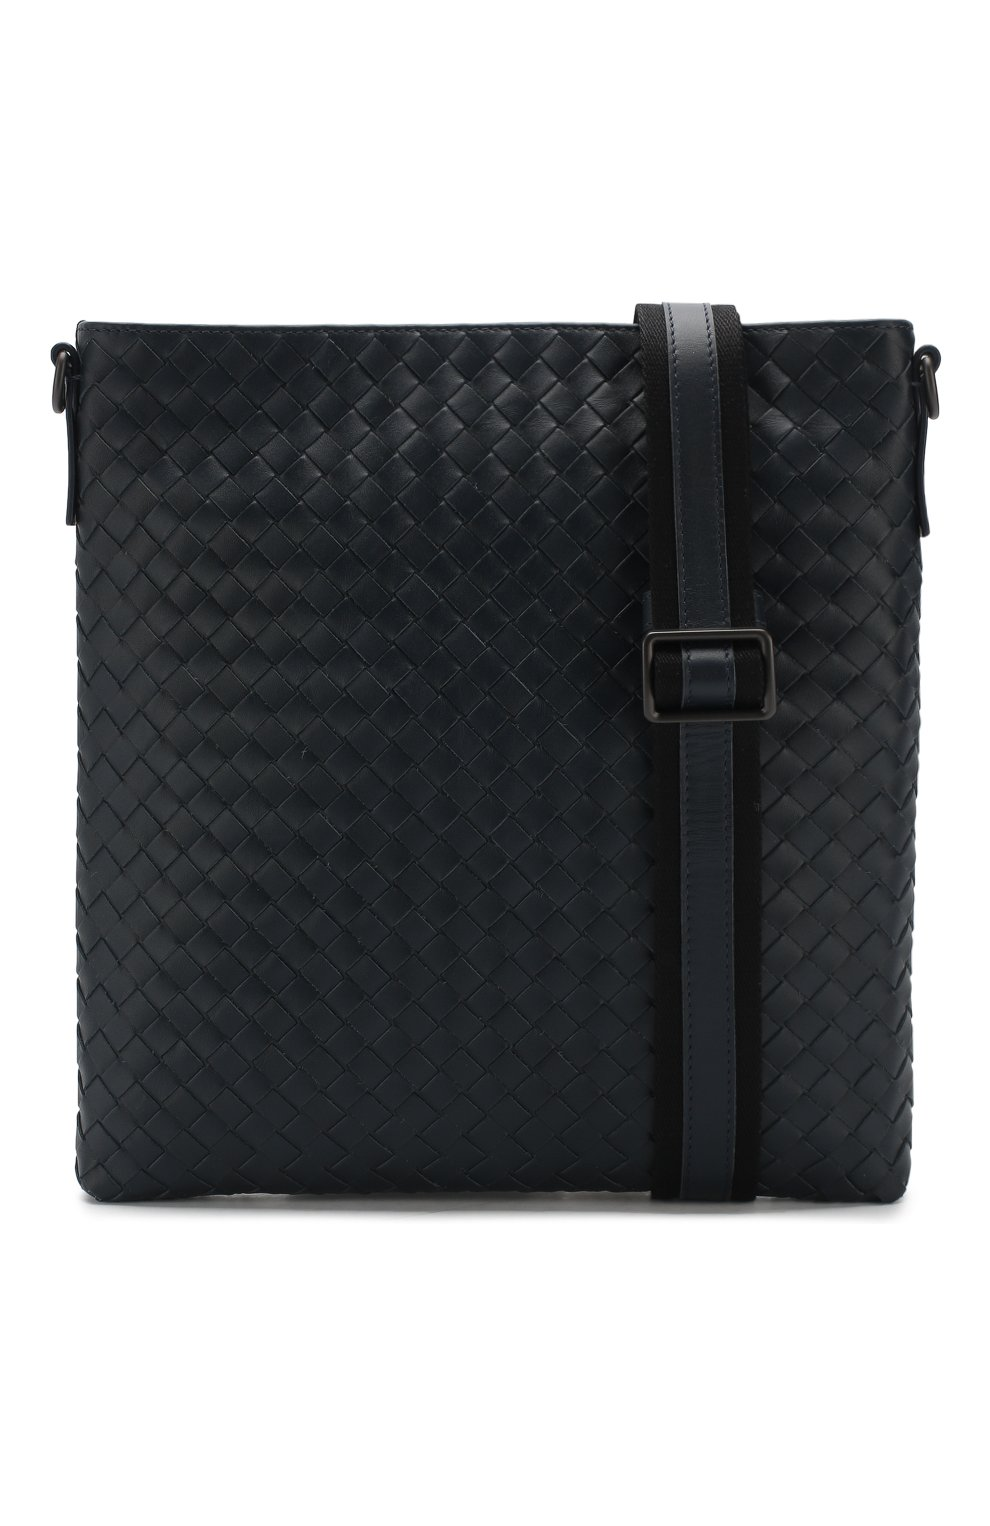 14aee7e0734c Кожаная сумка-планшет с плетением intrecciato Bottega Veneta темно-синяя    Фото №5